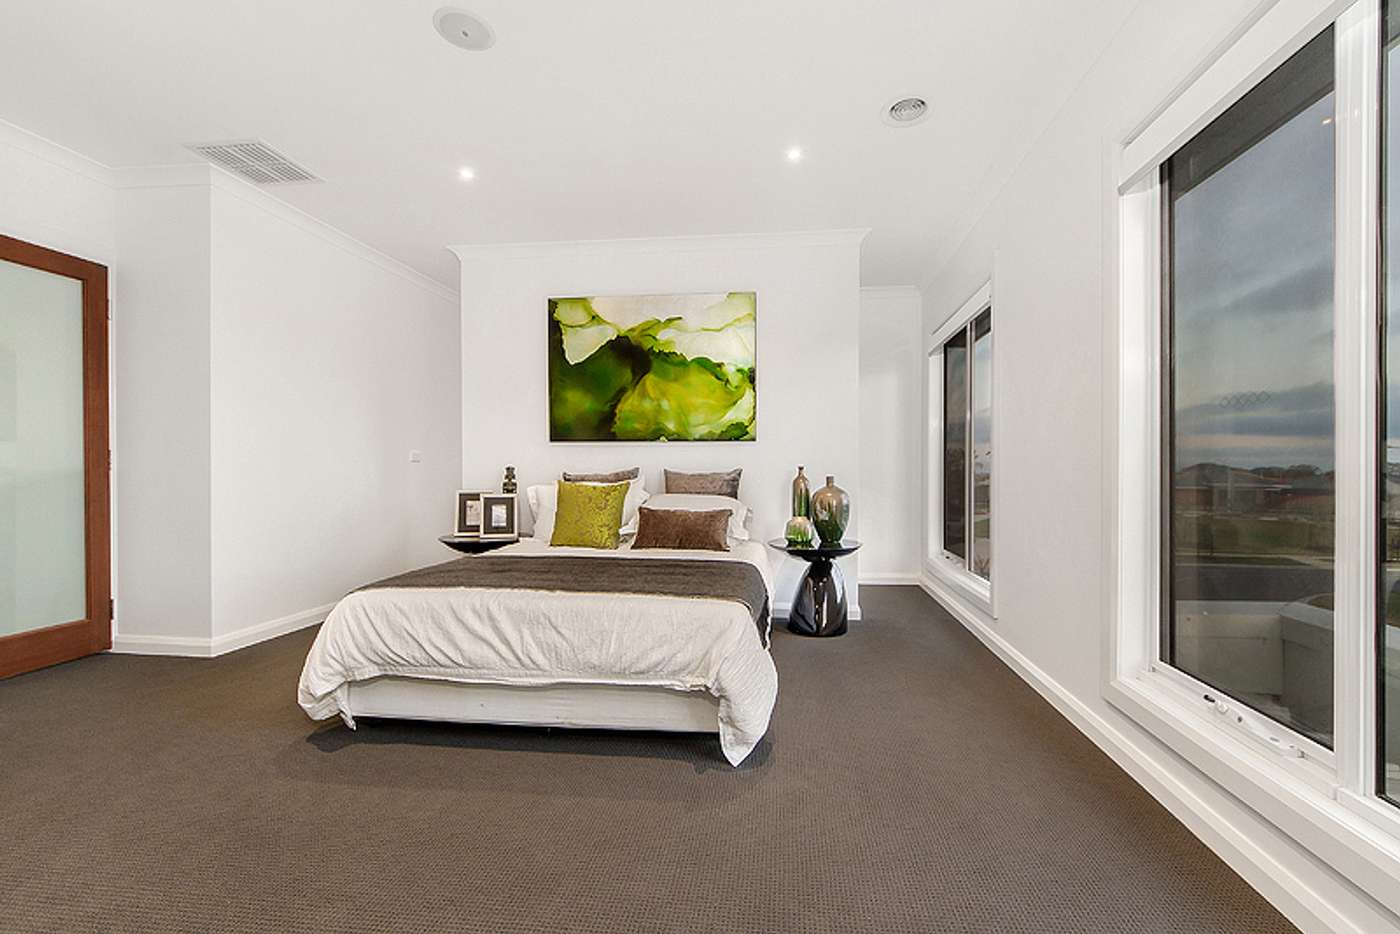 Sixth view of Homely house listing, 5705 Companion Street, Truganina VIC 3029